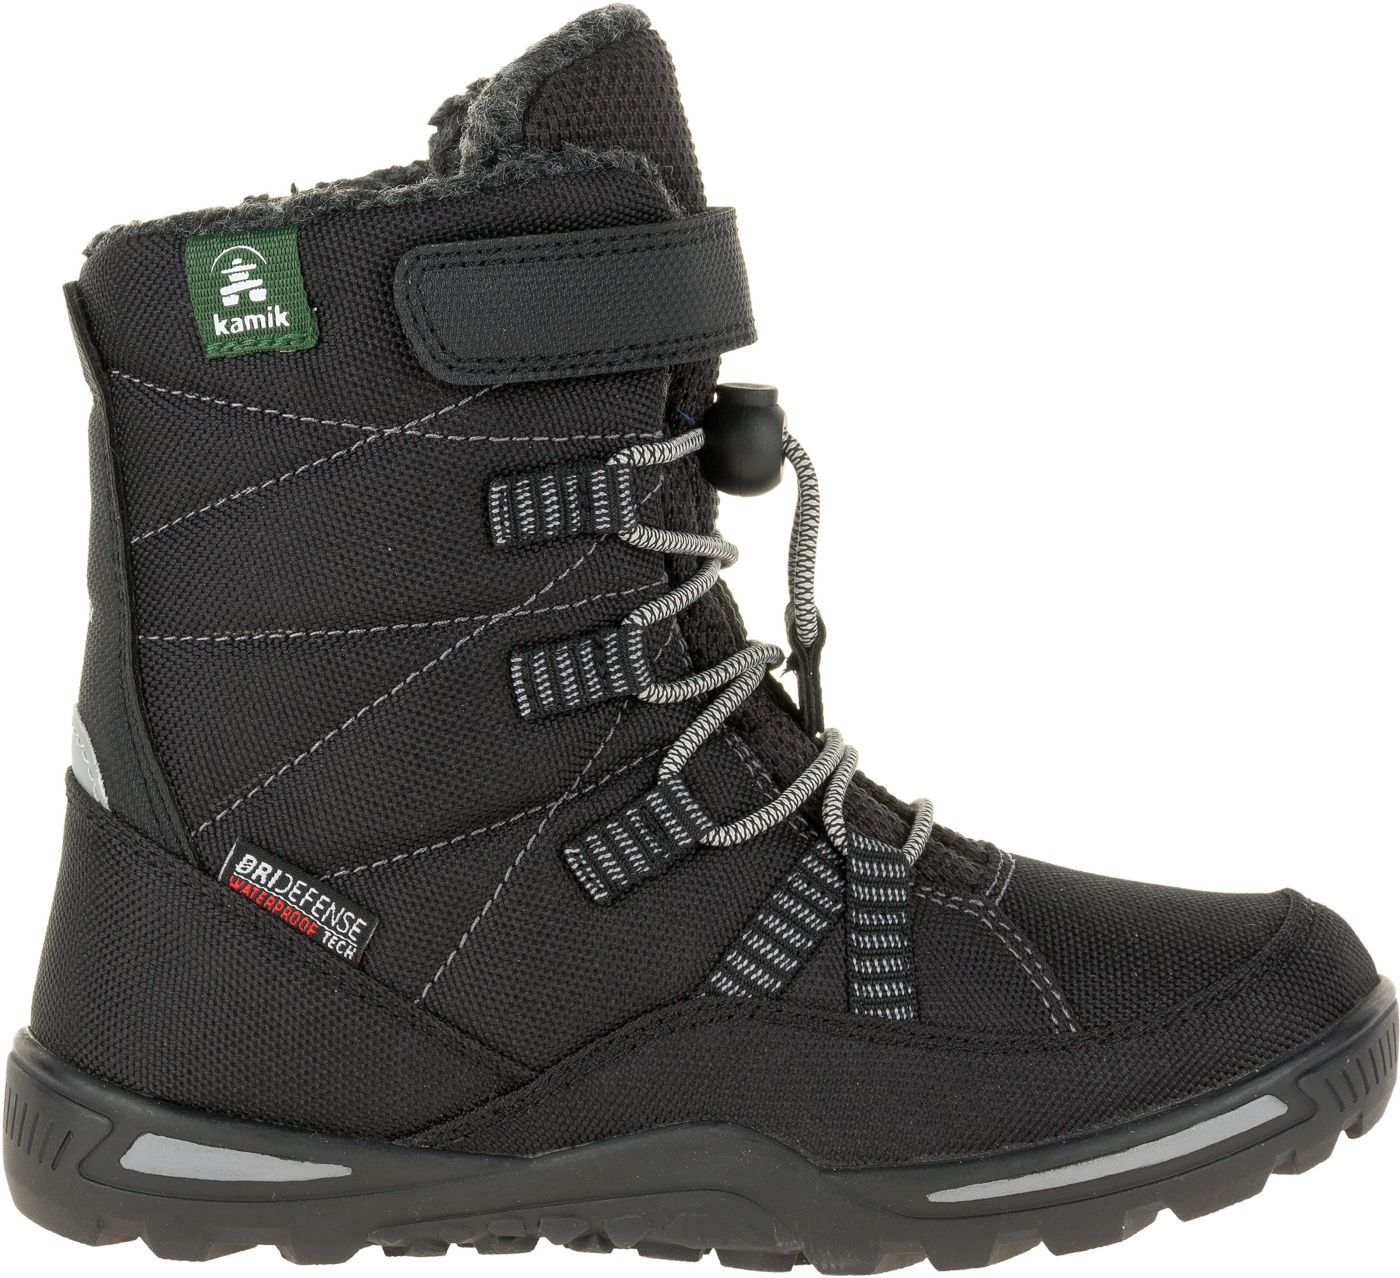 Kamik Kids' Jace Insulated Waterproof Winter Boots